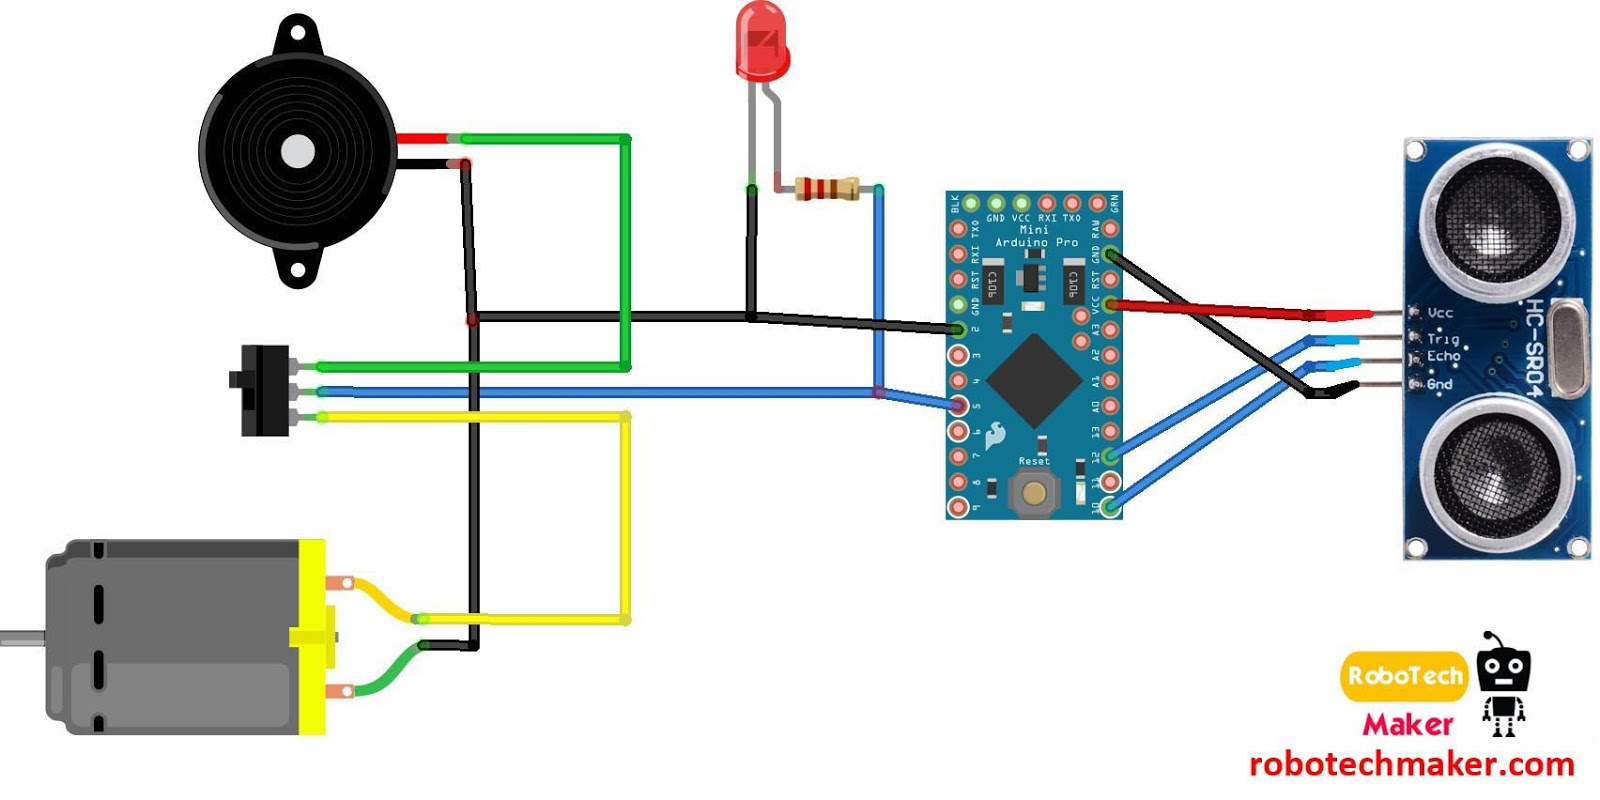 Robotech Maker Third Eye For The Blind Arduino Wiring Diagram Online Circuit